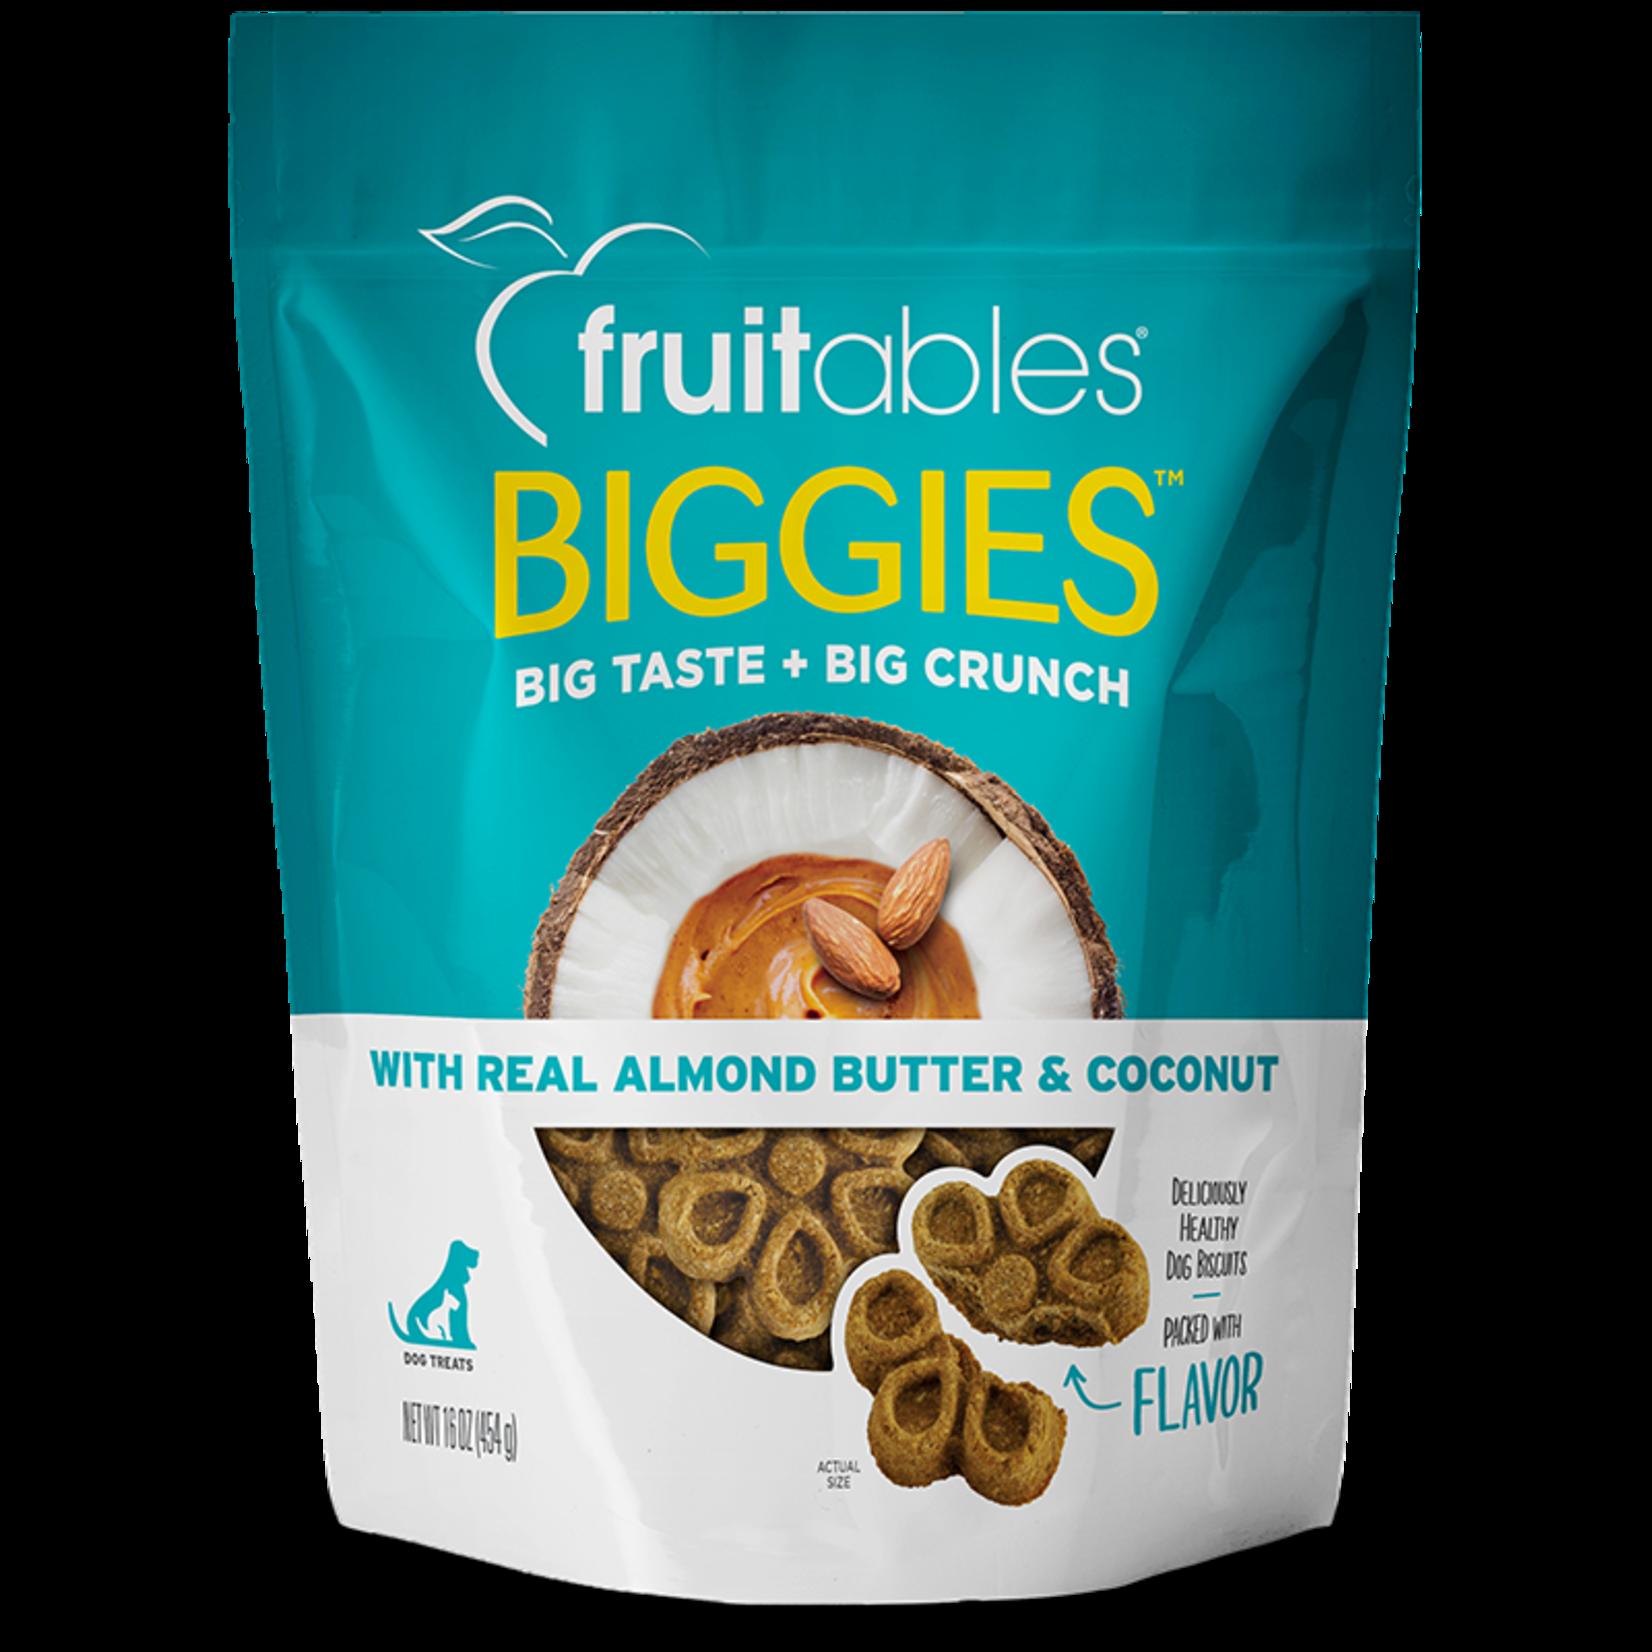 Fruitables Fruitables Biggies Almond Butter & Coconut Dog Treat 16oz